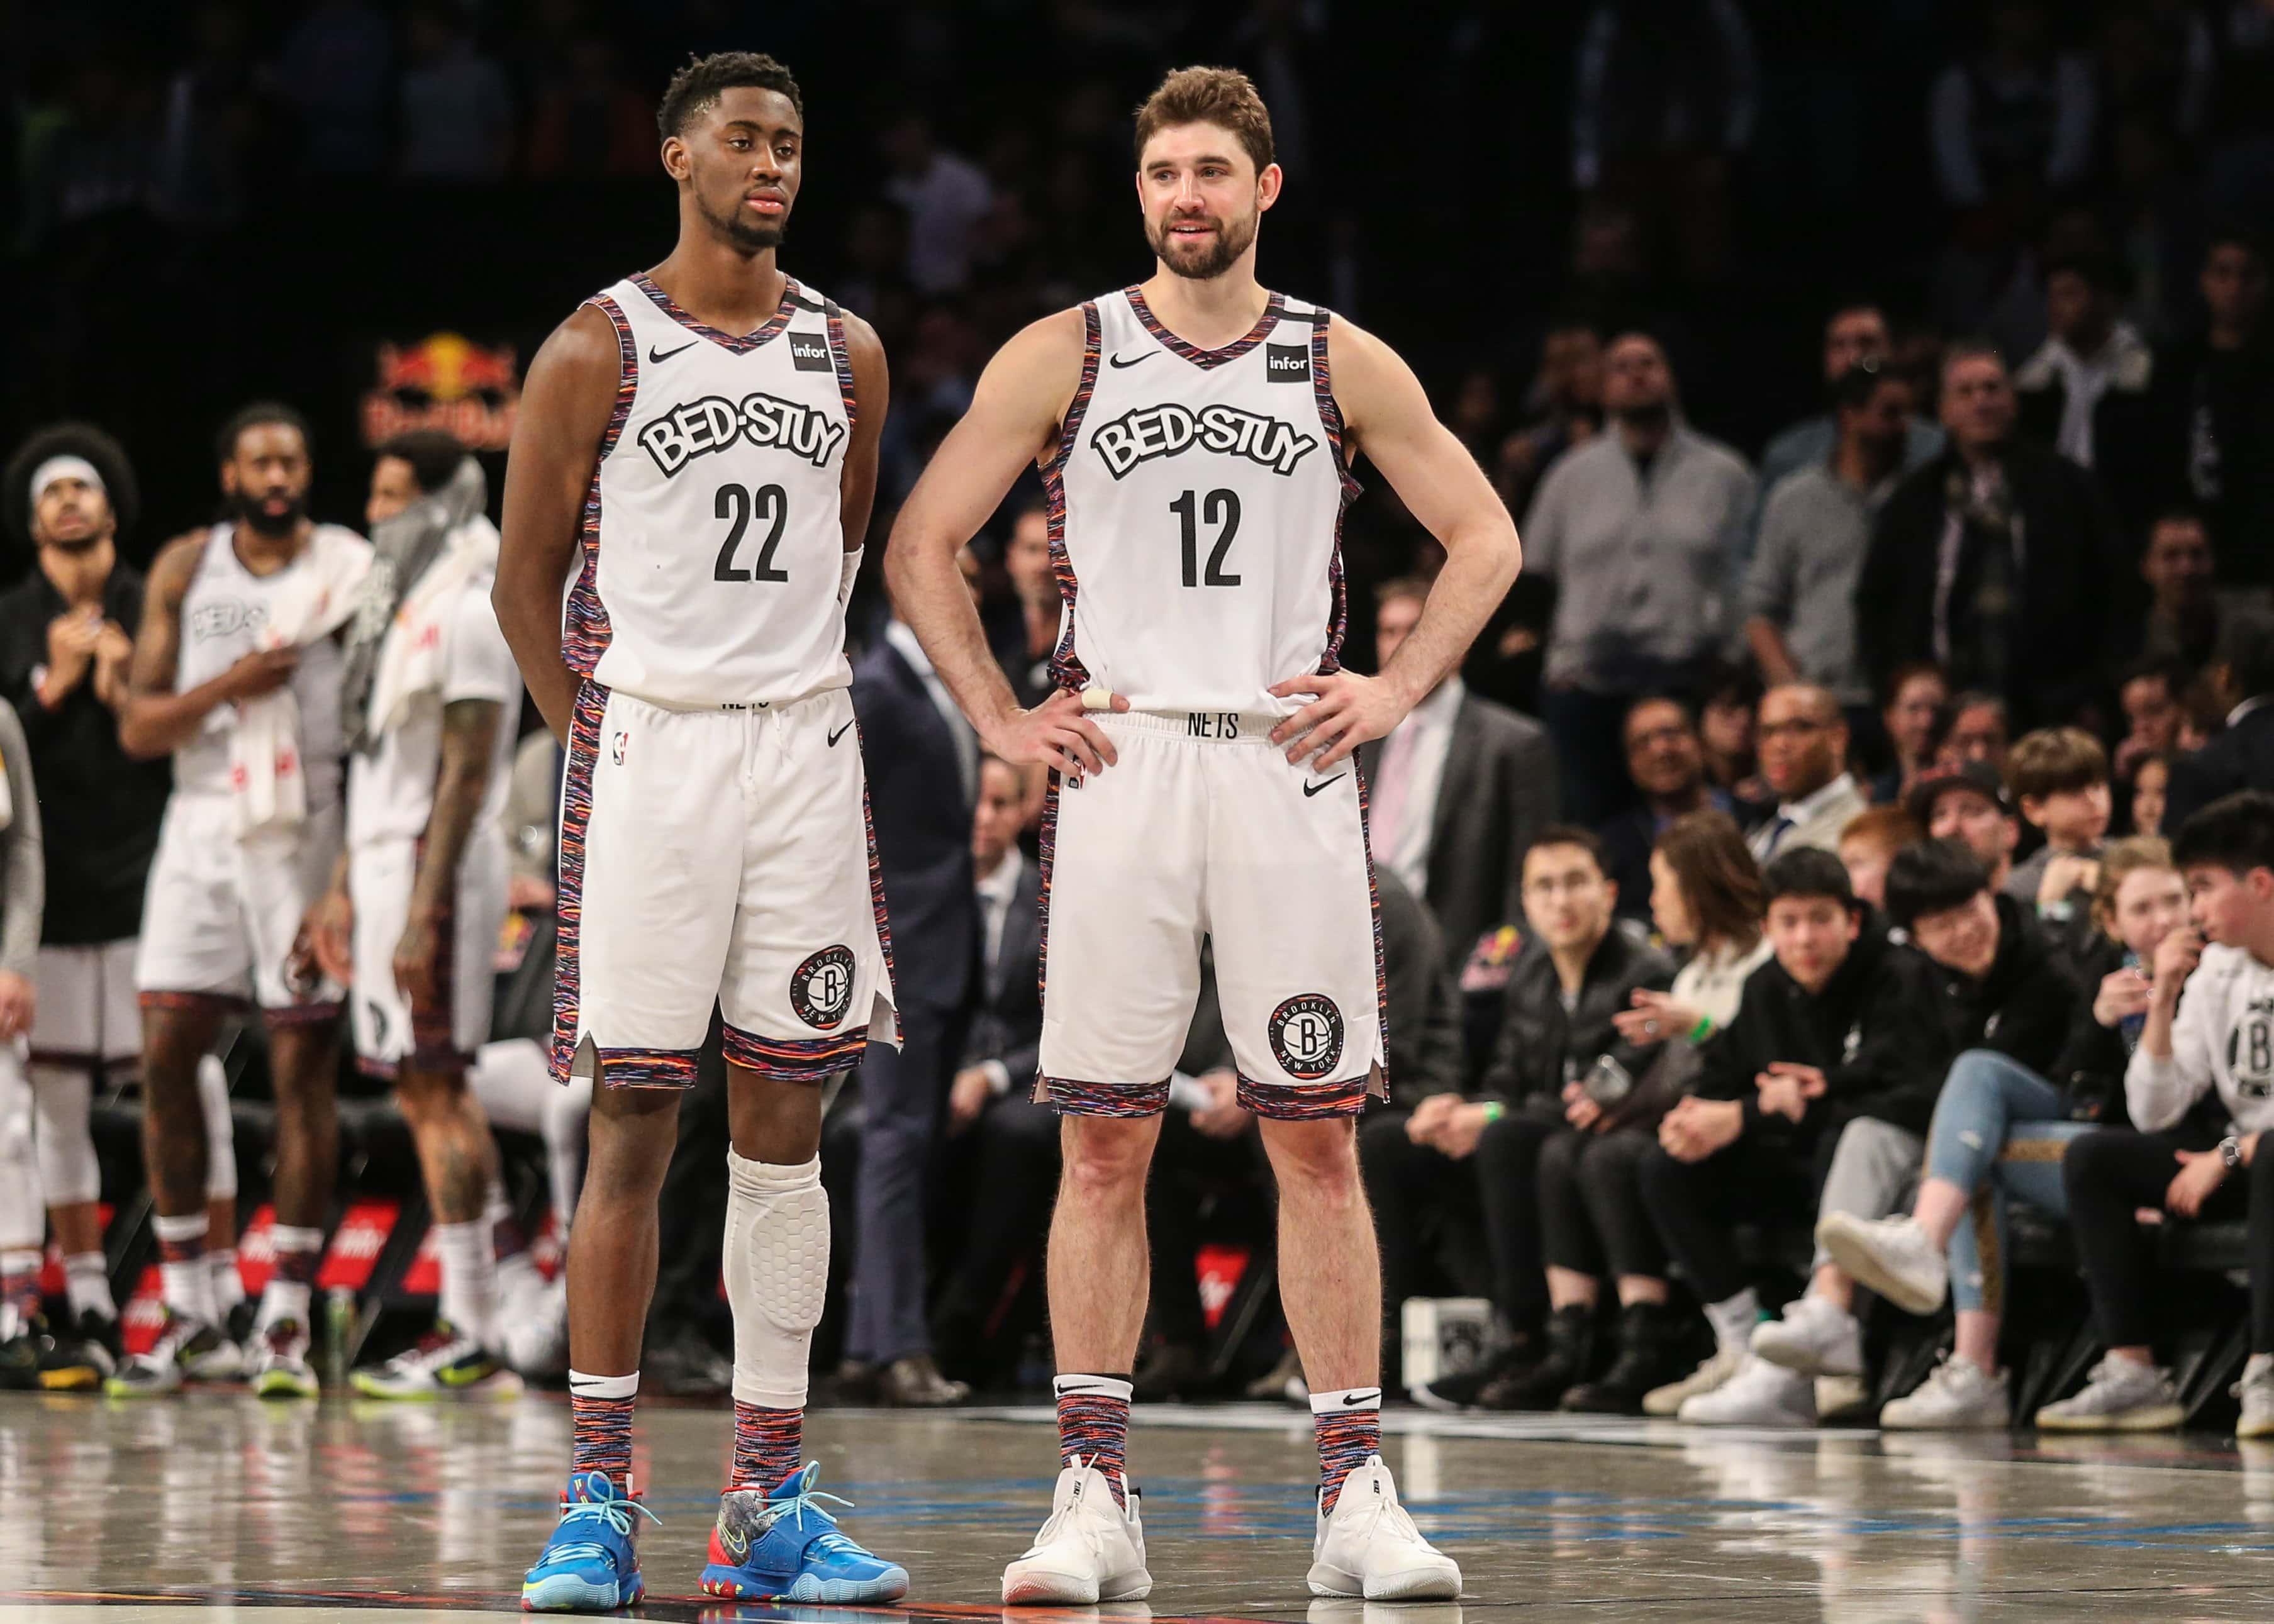 Mar 8, 2020; Brooklyn, New York, USA; Brooklyn Nets guard Caris LaVert (22) and forward Joe Harris (12) at Barclays Center. Mandatory Credit: Wendell Cruz-USA TODAY Sports